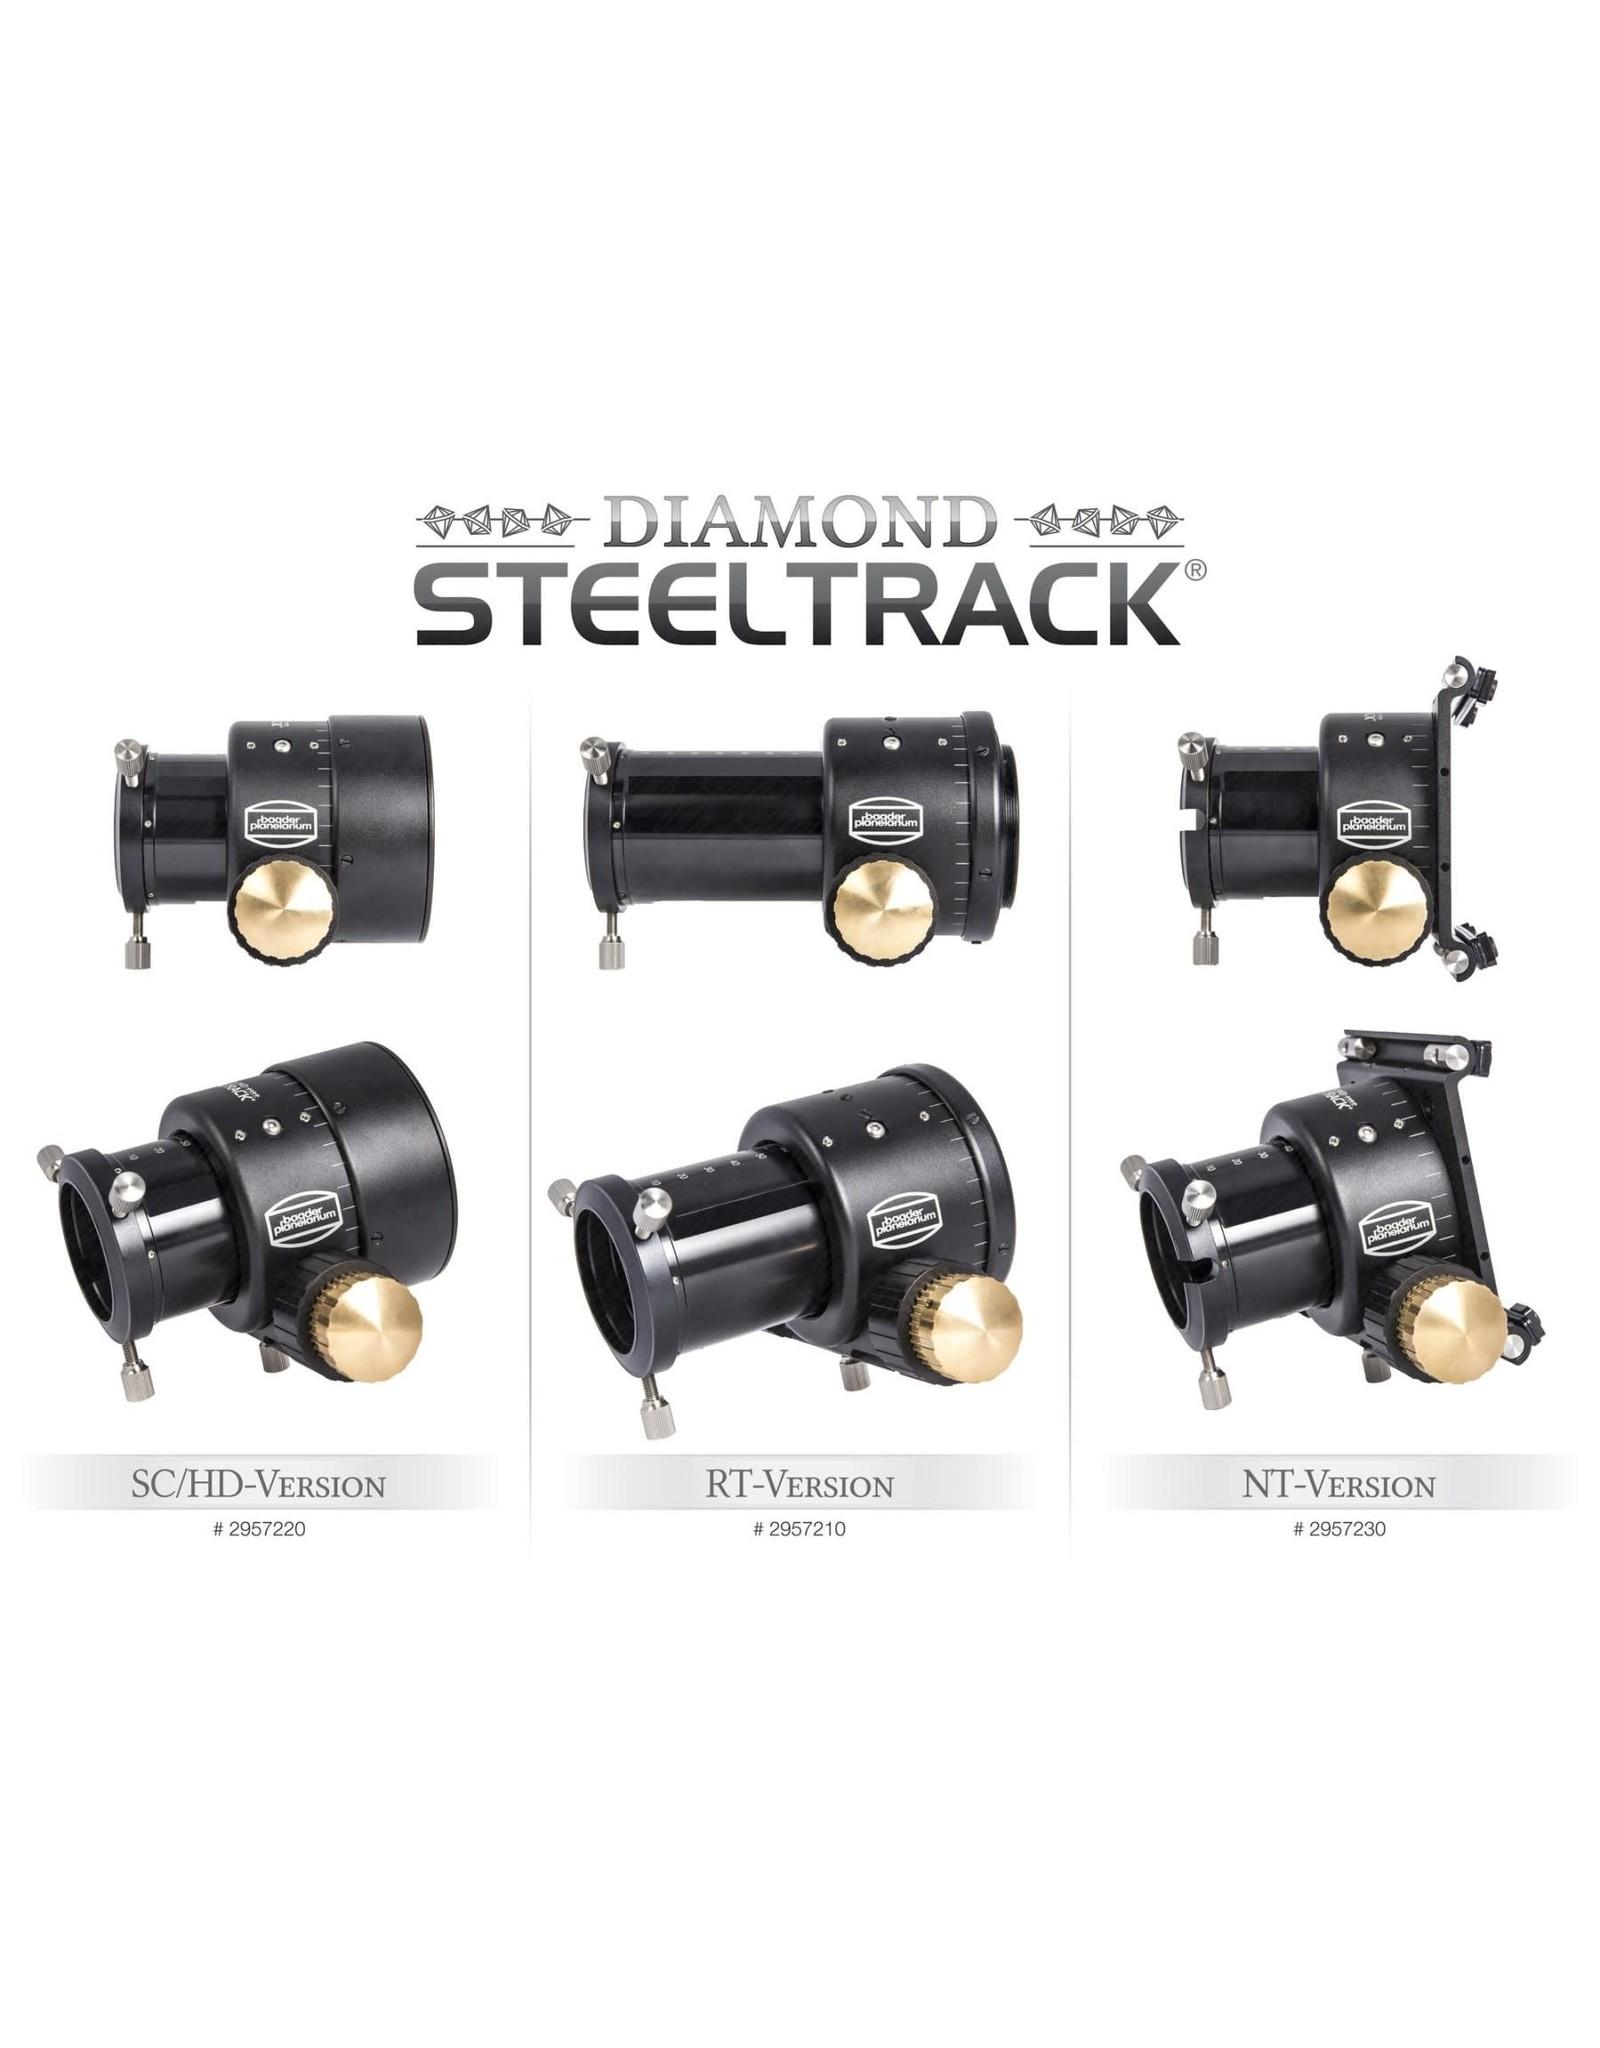 "Baader Planetarium 2"" BDS-NT Baader Diamond Steeltrack® Focuser"